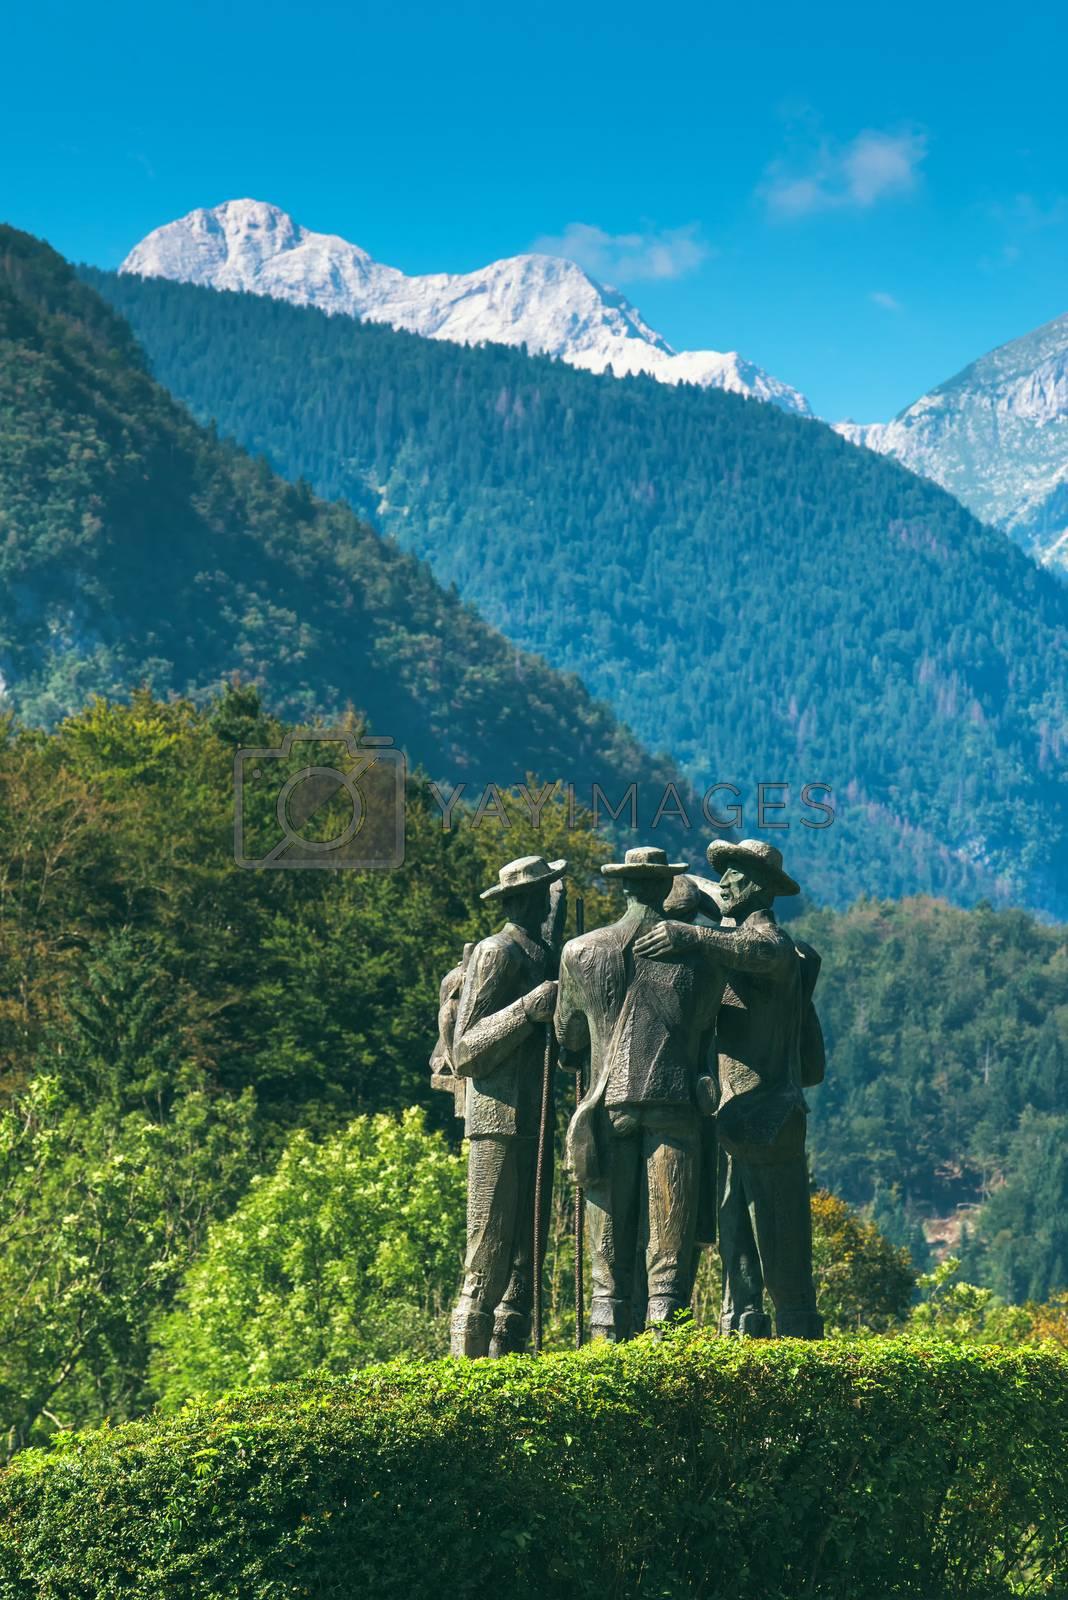 Four brave men from Bohinj - the first men on Triglav by stevanovicigor